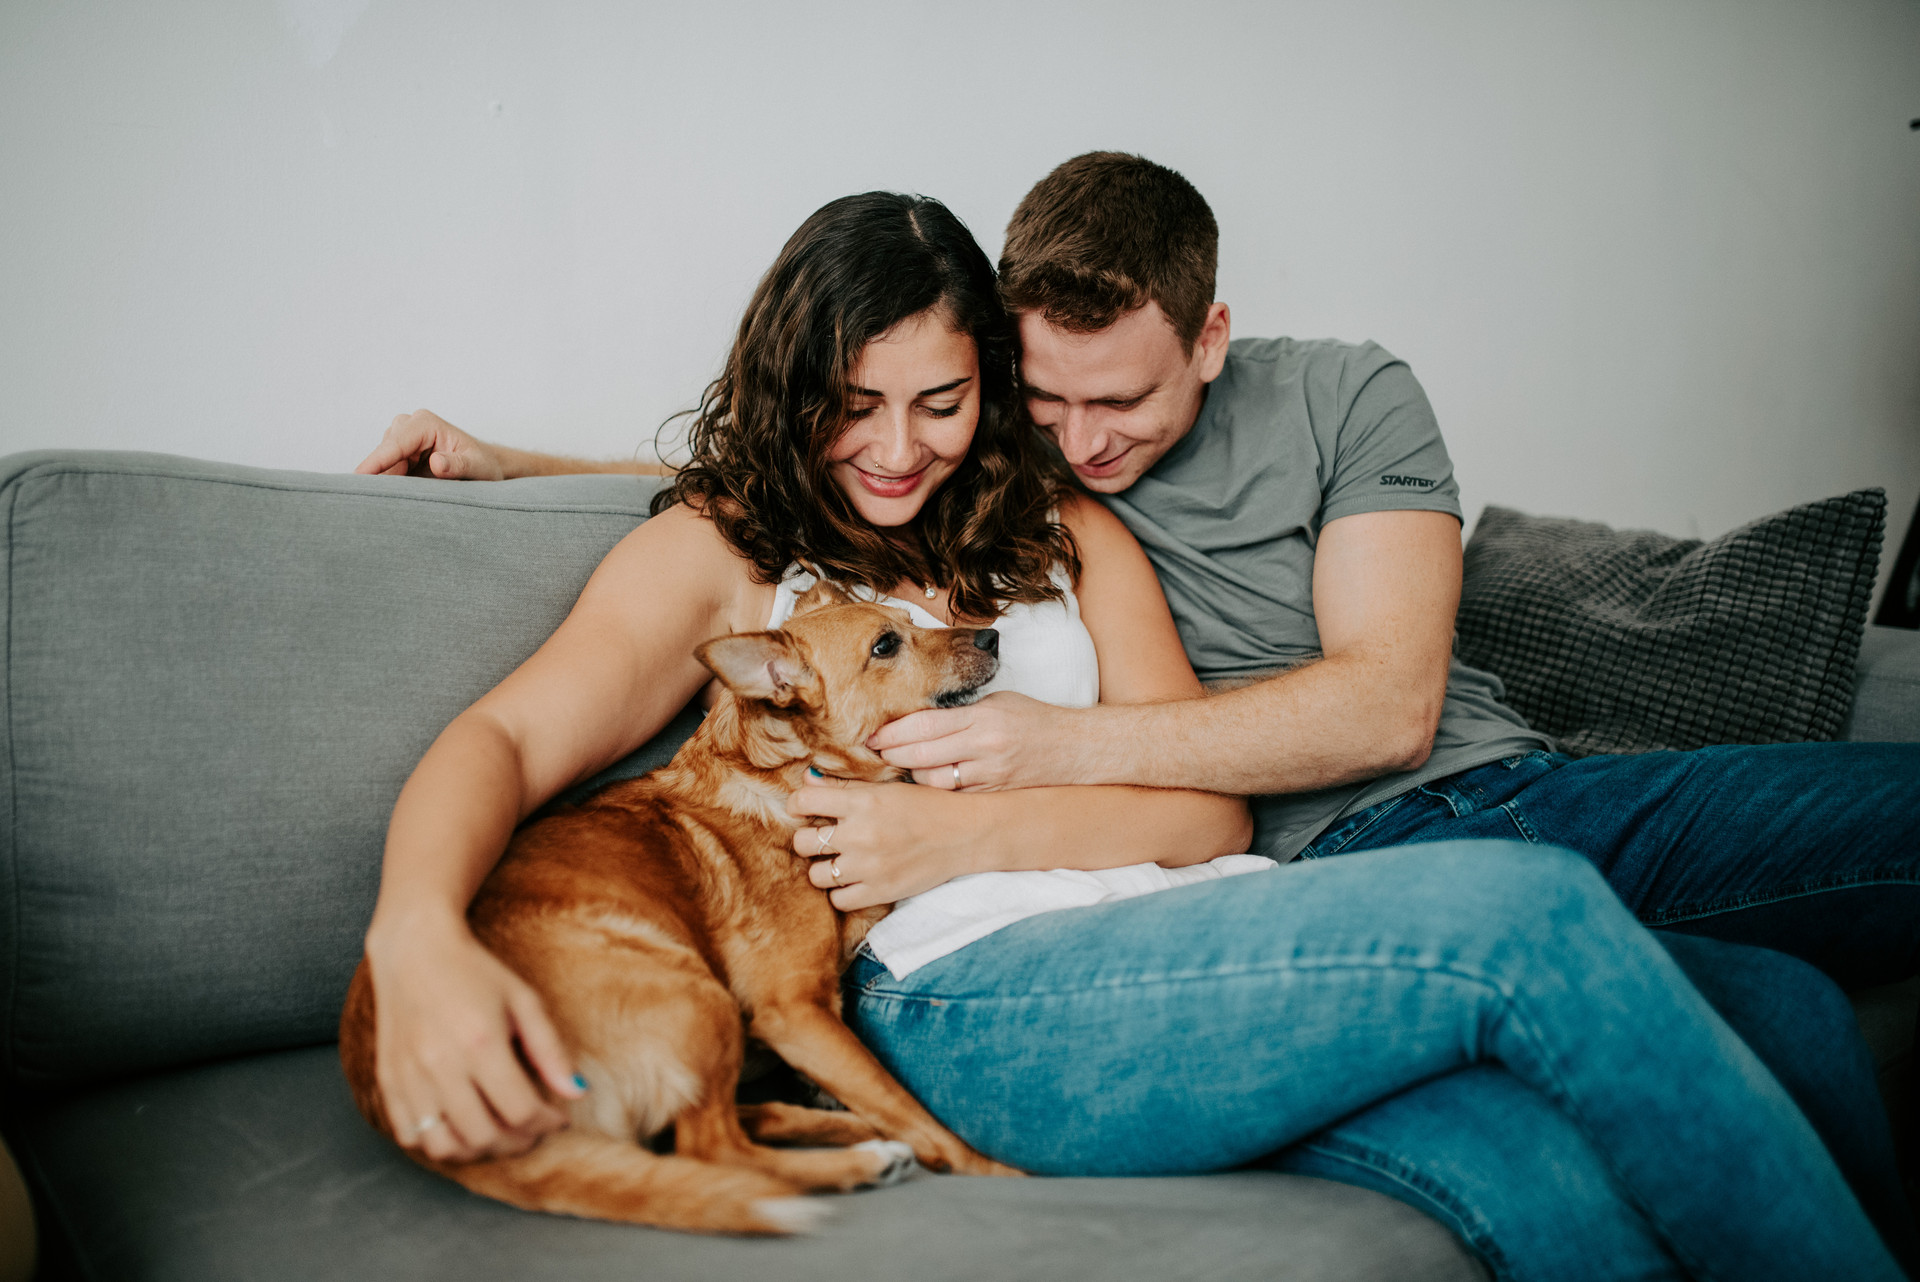 Natalie&Benny-4.jpg